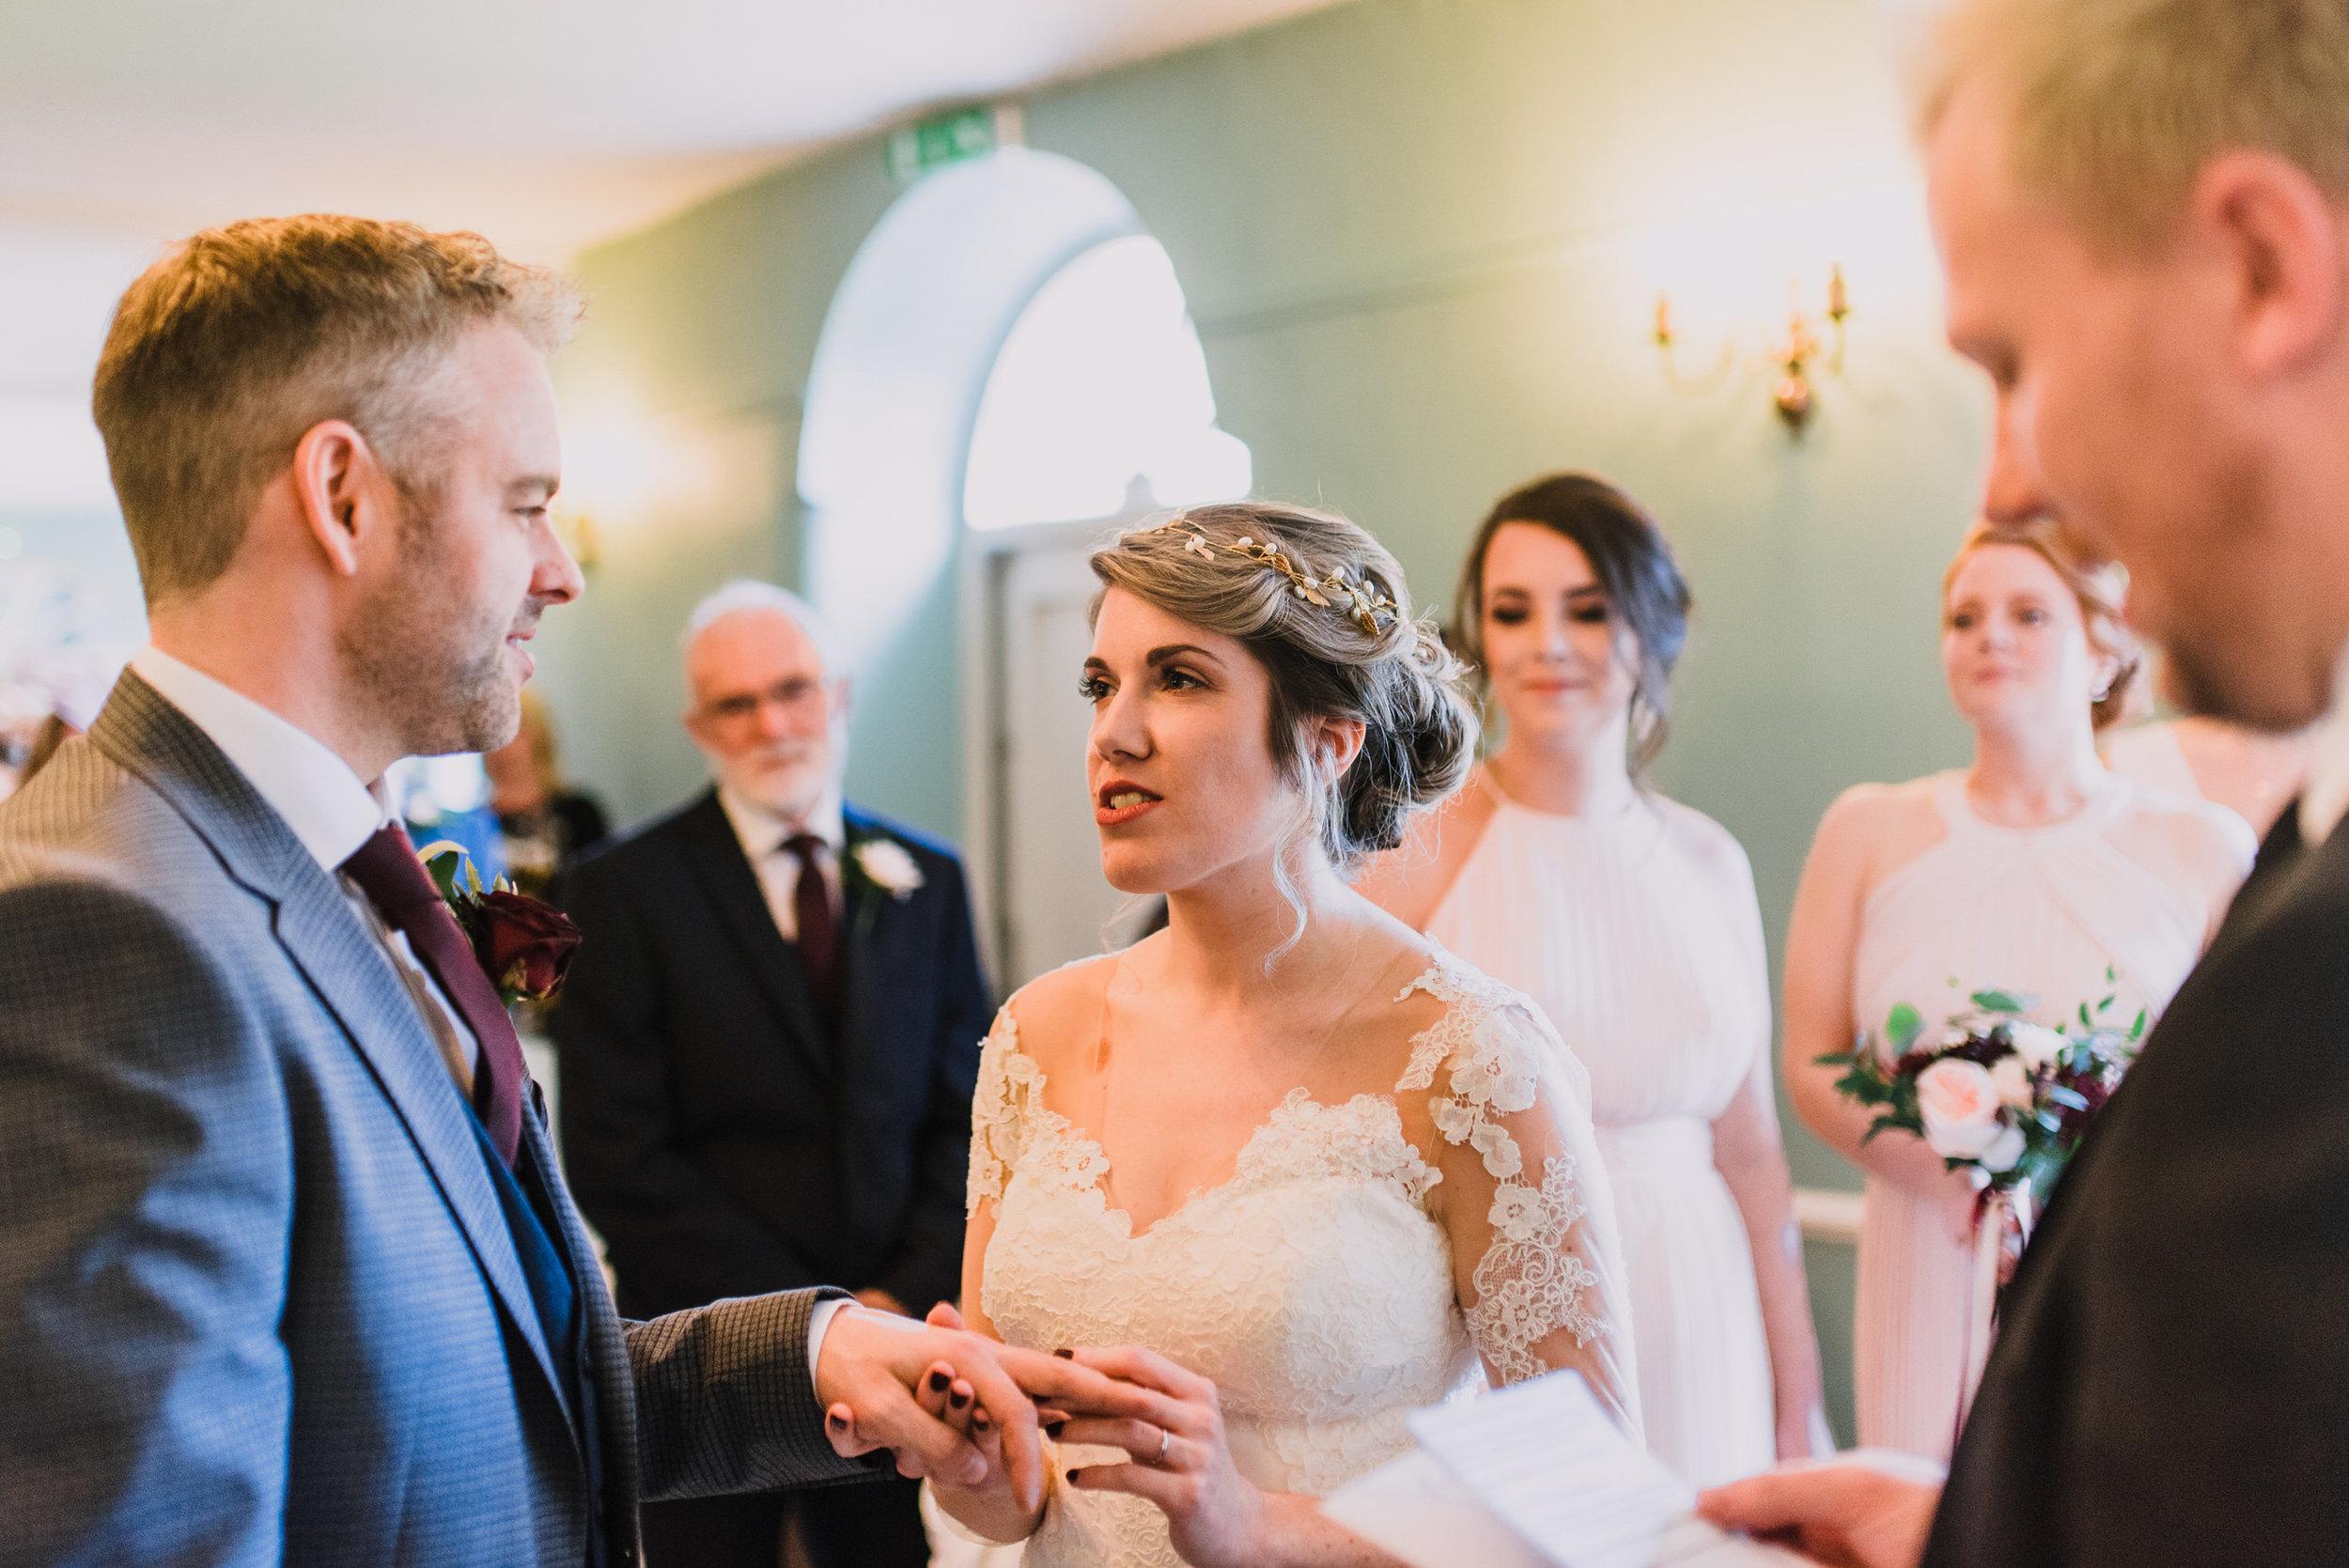 lissanoure castle wedding, northern ireland wedding photographer, romantic northern irish wedding venue, castle wedding ireland, natural wedding photography ni (57).jpg